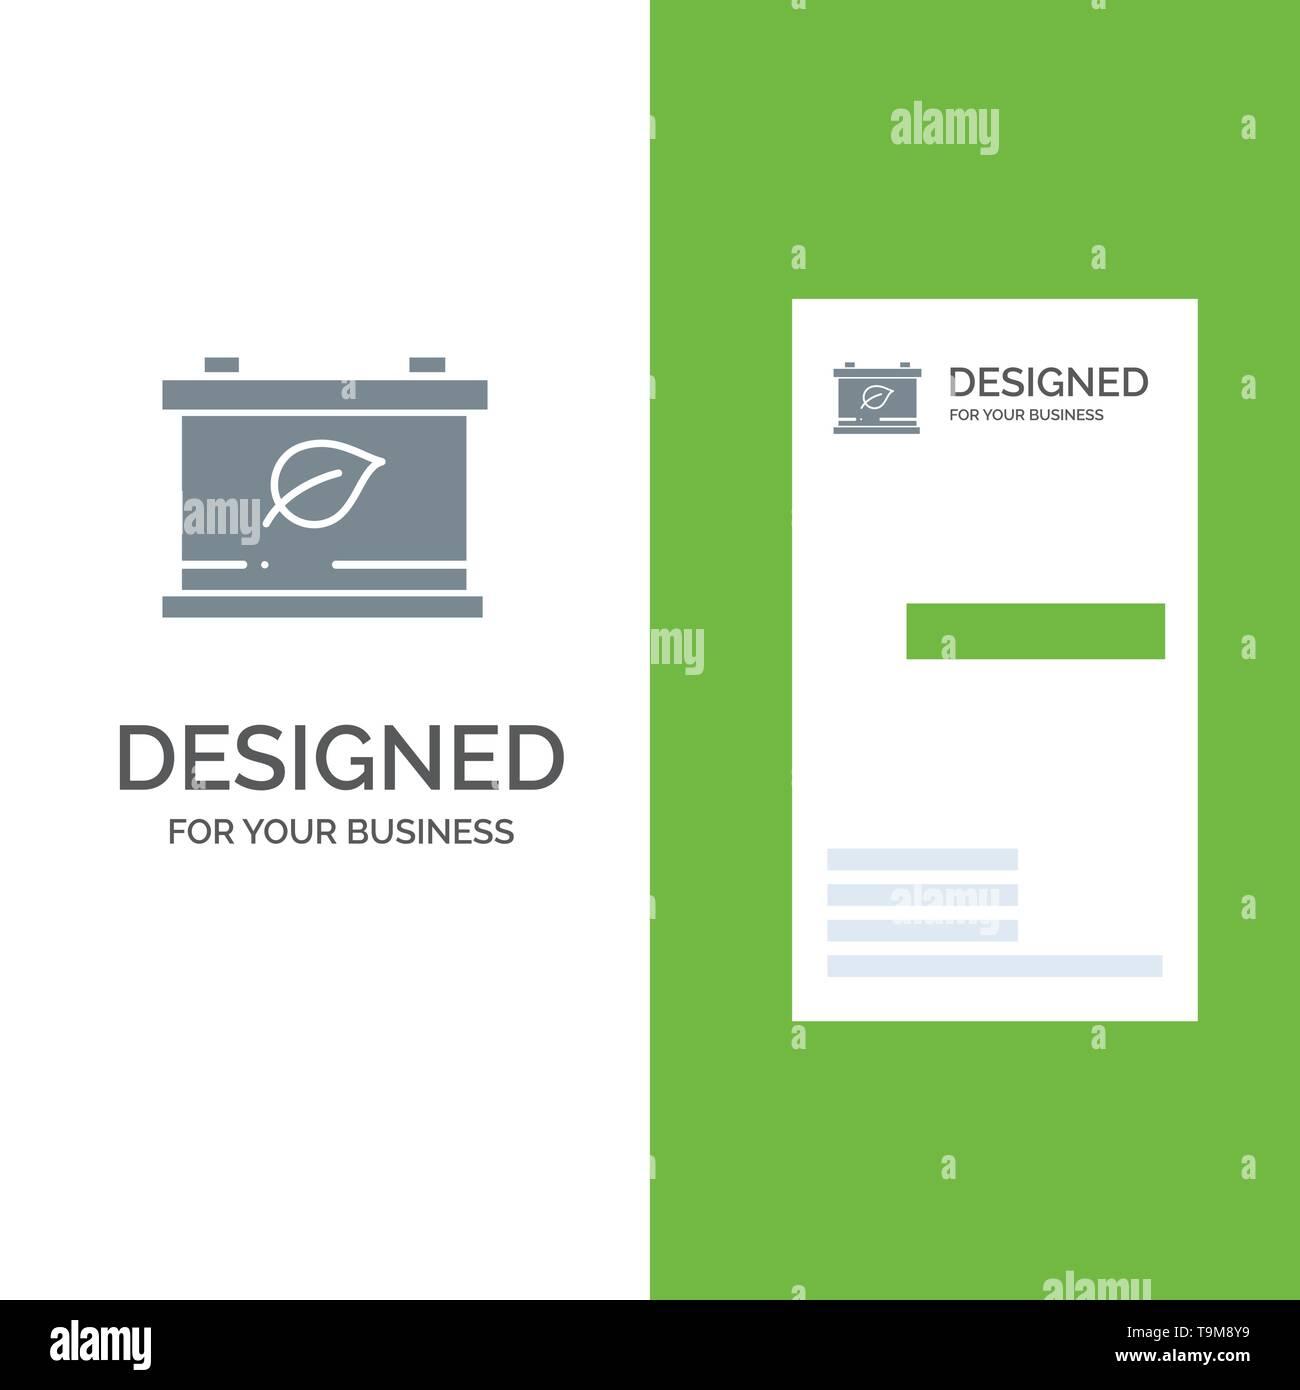 Batterie, Speichern, Grün Grau Logo Design und Business Card Template Stockbild